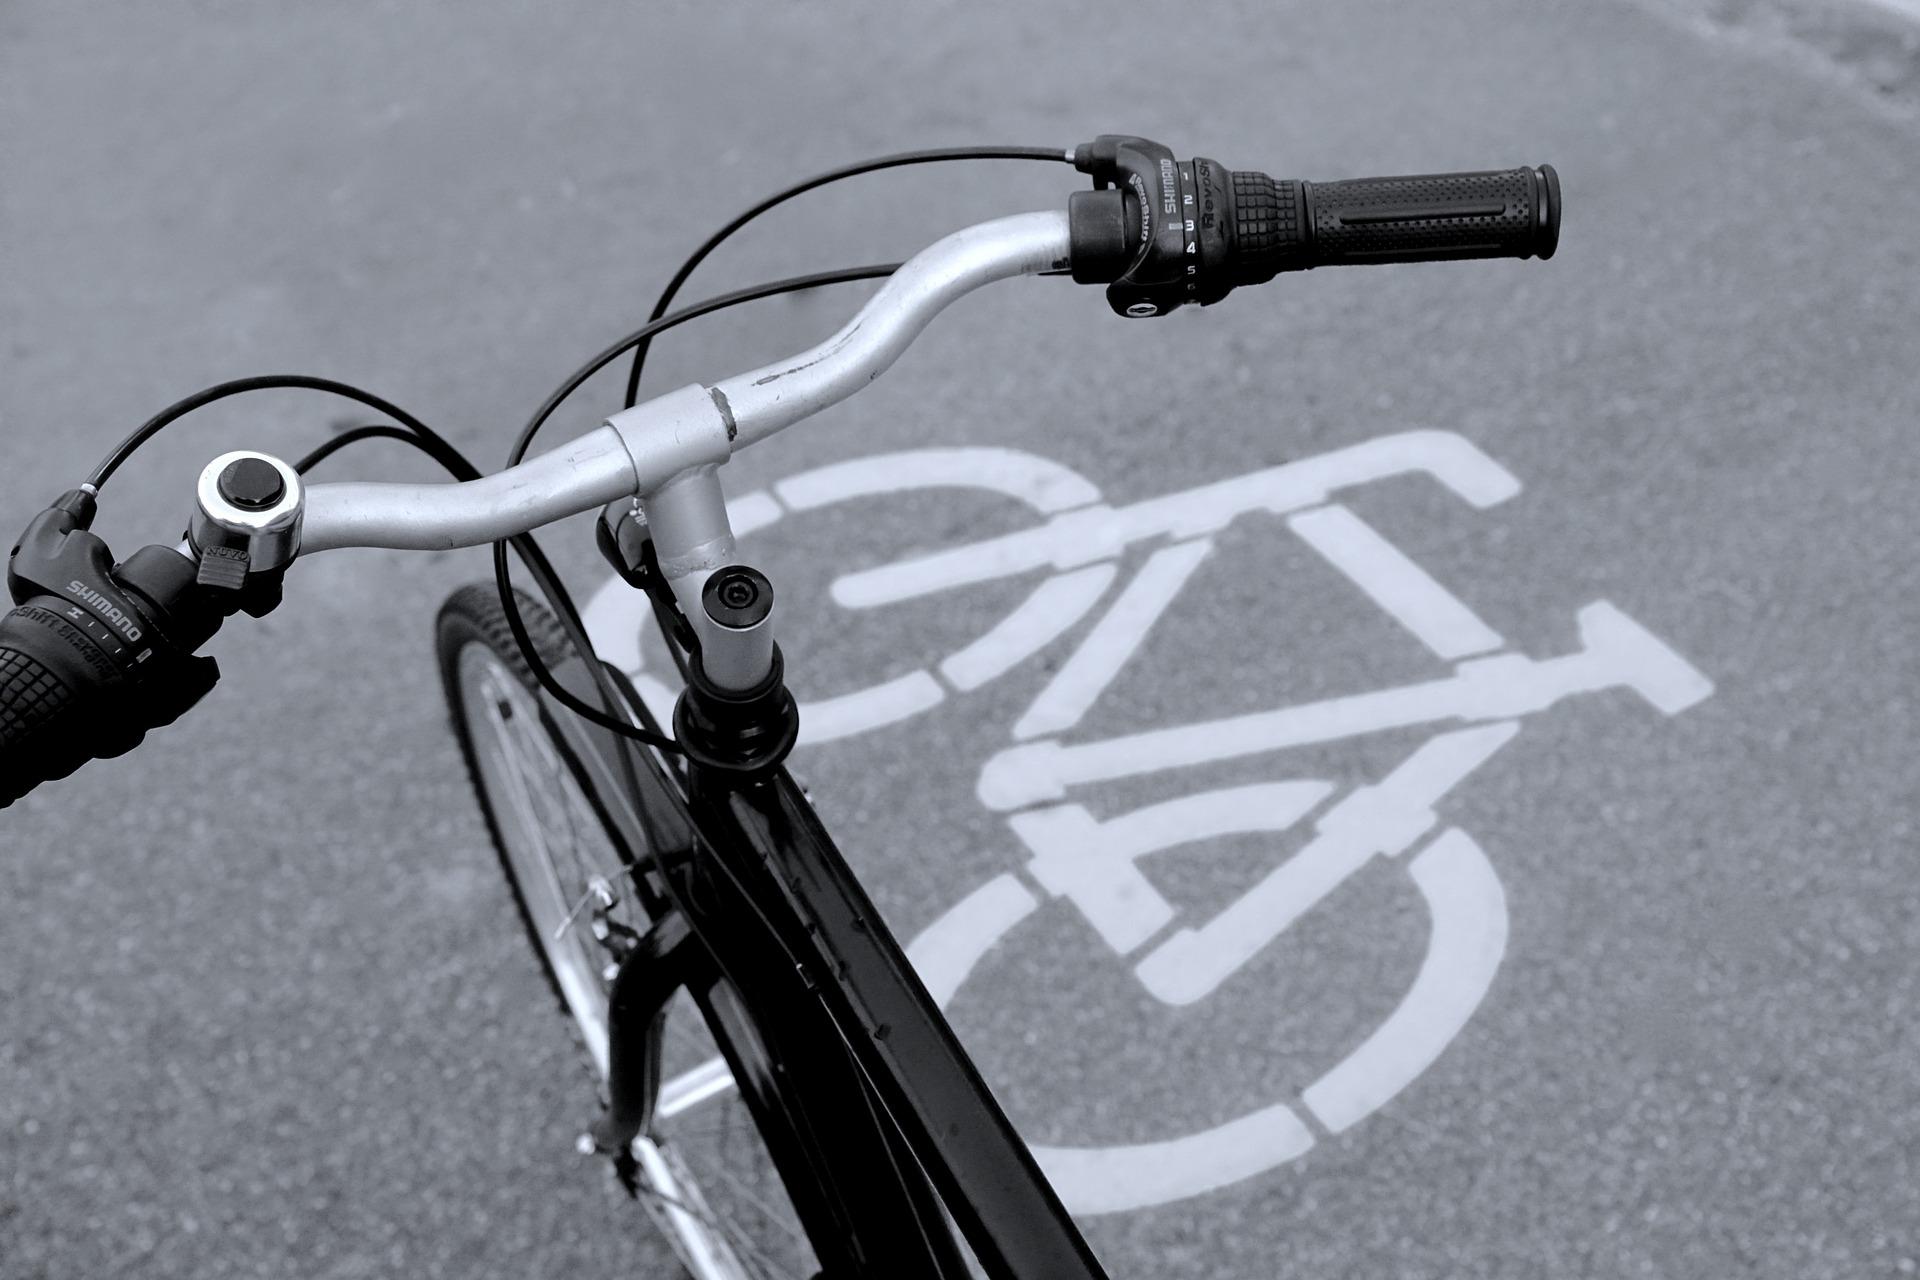 bicycle-path-830216_1920.jpg